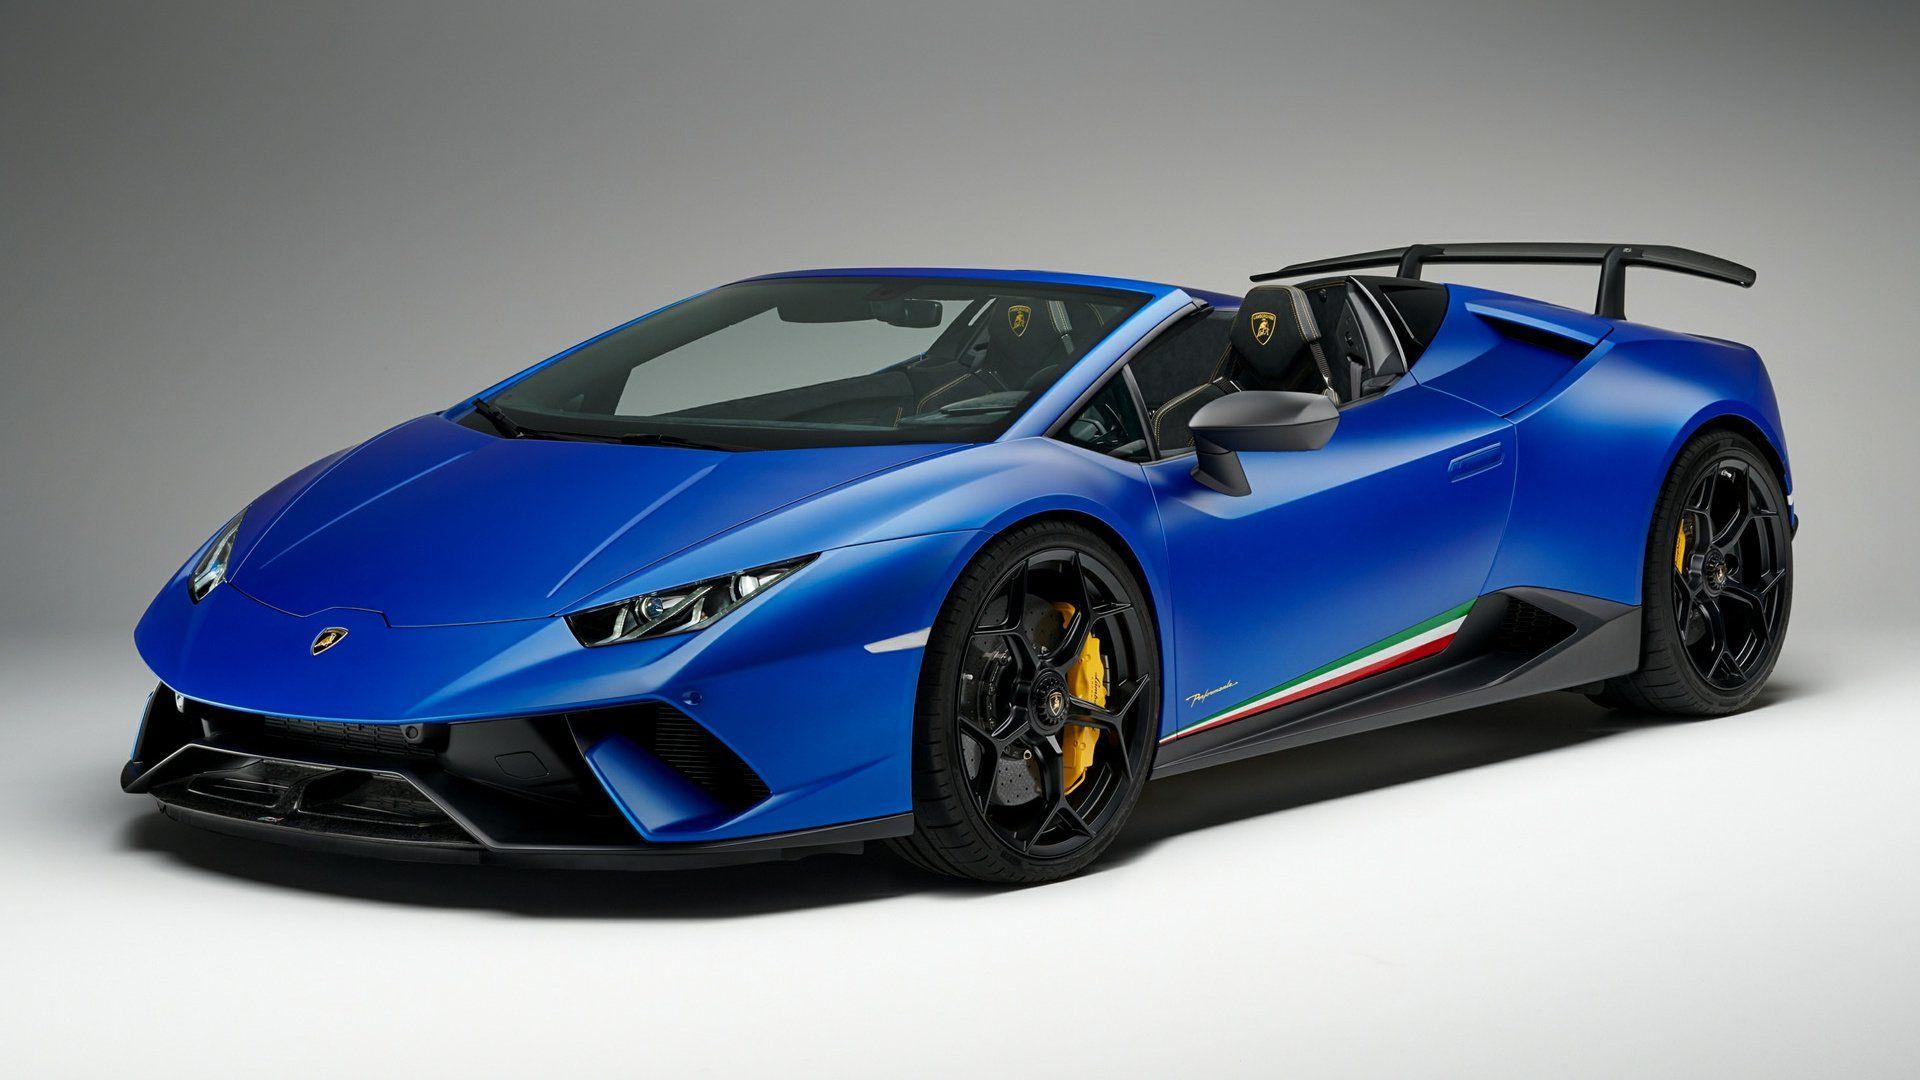 2018 Lamborghini Huracan Performante Spyder Vehicles Lamborghini Huracan Performante Lamborghini Lamborg Lamborghini Huracan Super Cars Sports Cars Lamborghini